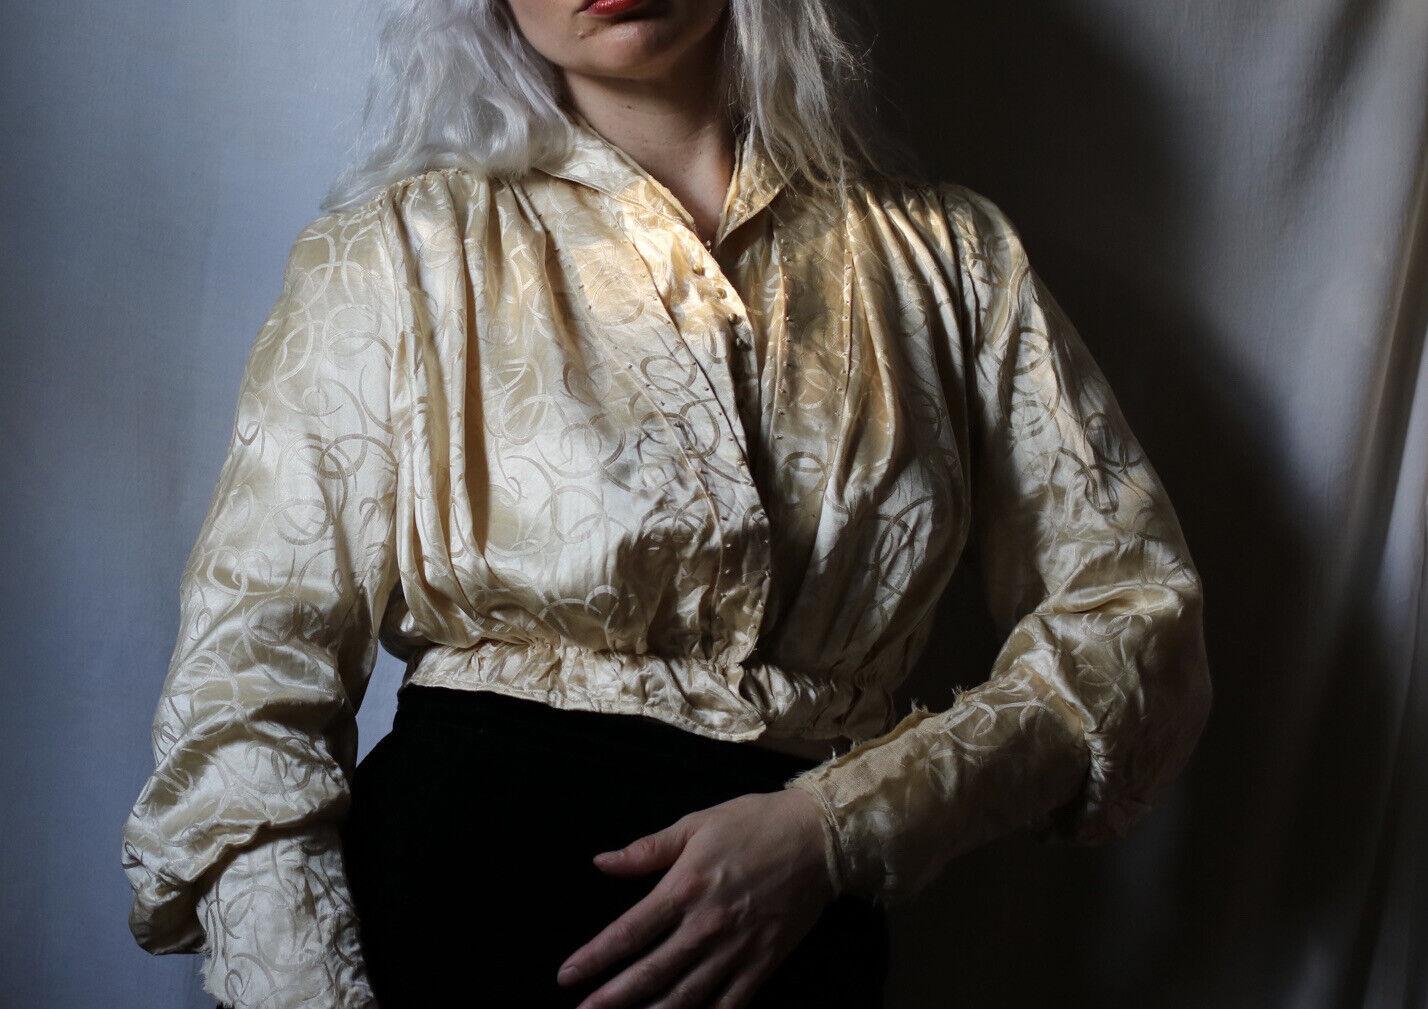 Antique Edwardian Silk Cream Crescent Moon Blouse - image 1